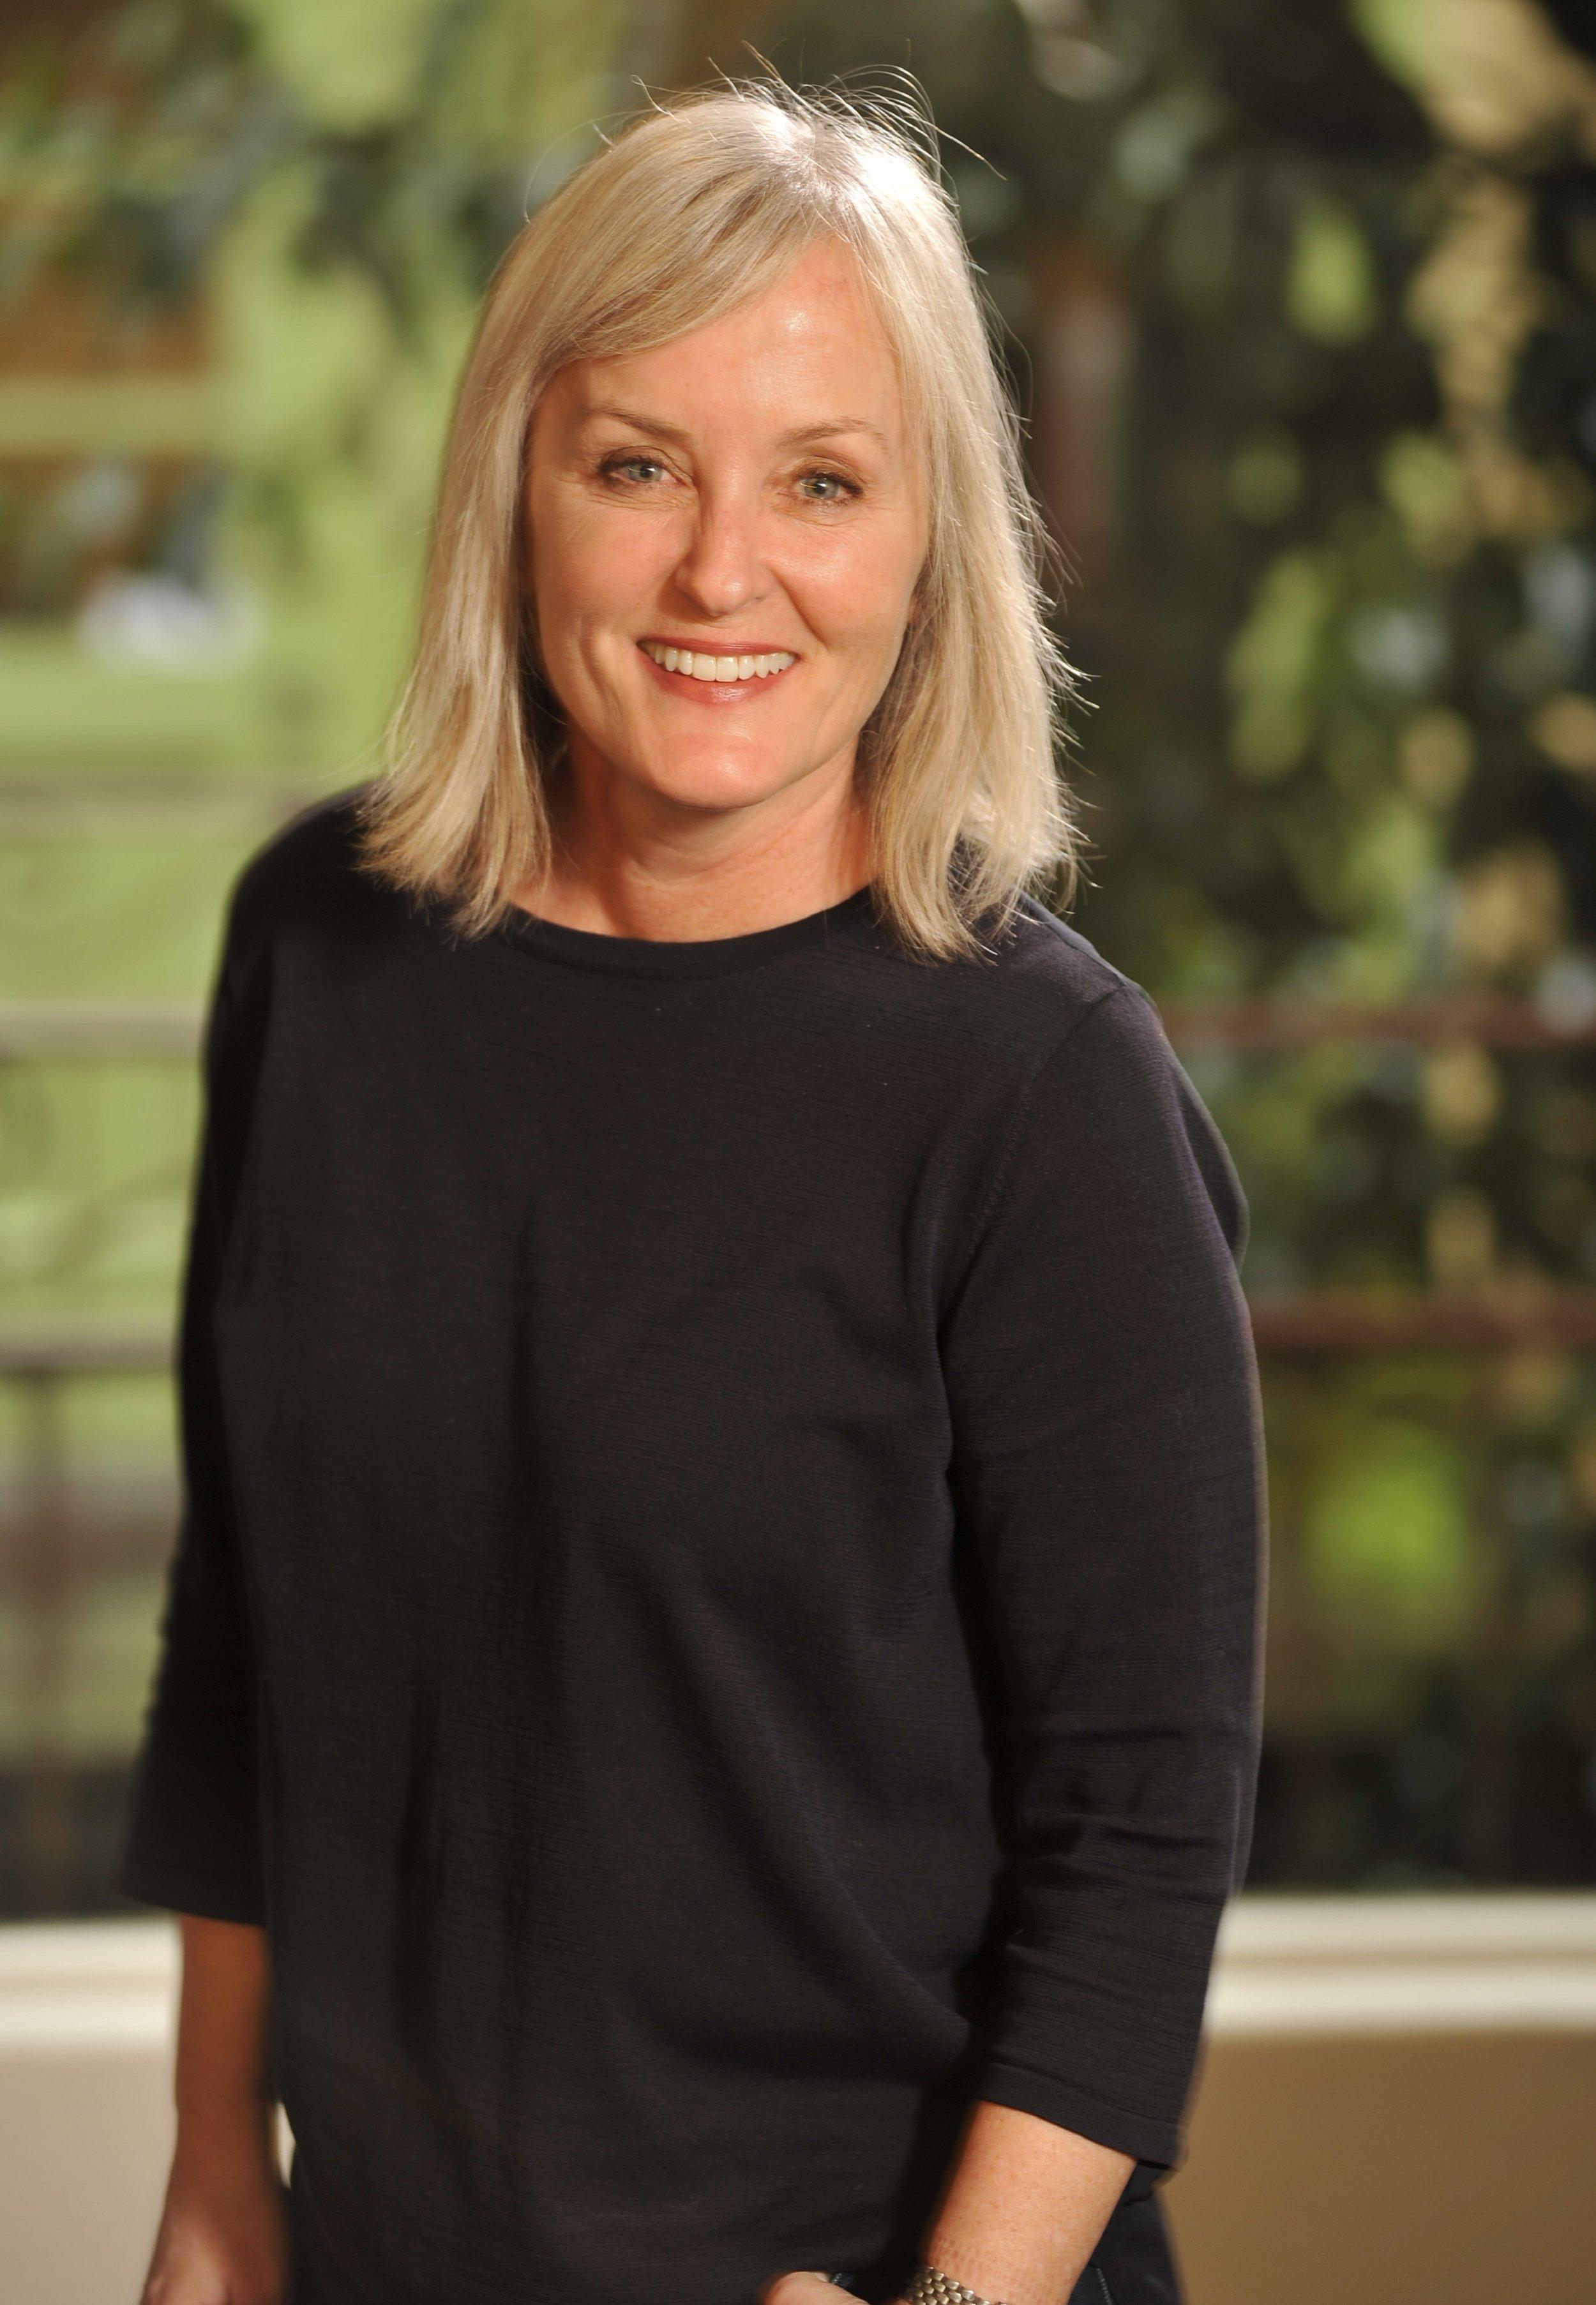 Rebecca HutchinsonVice President of Communications and Development - rebeccahutchinson@imaginela.org